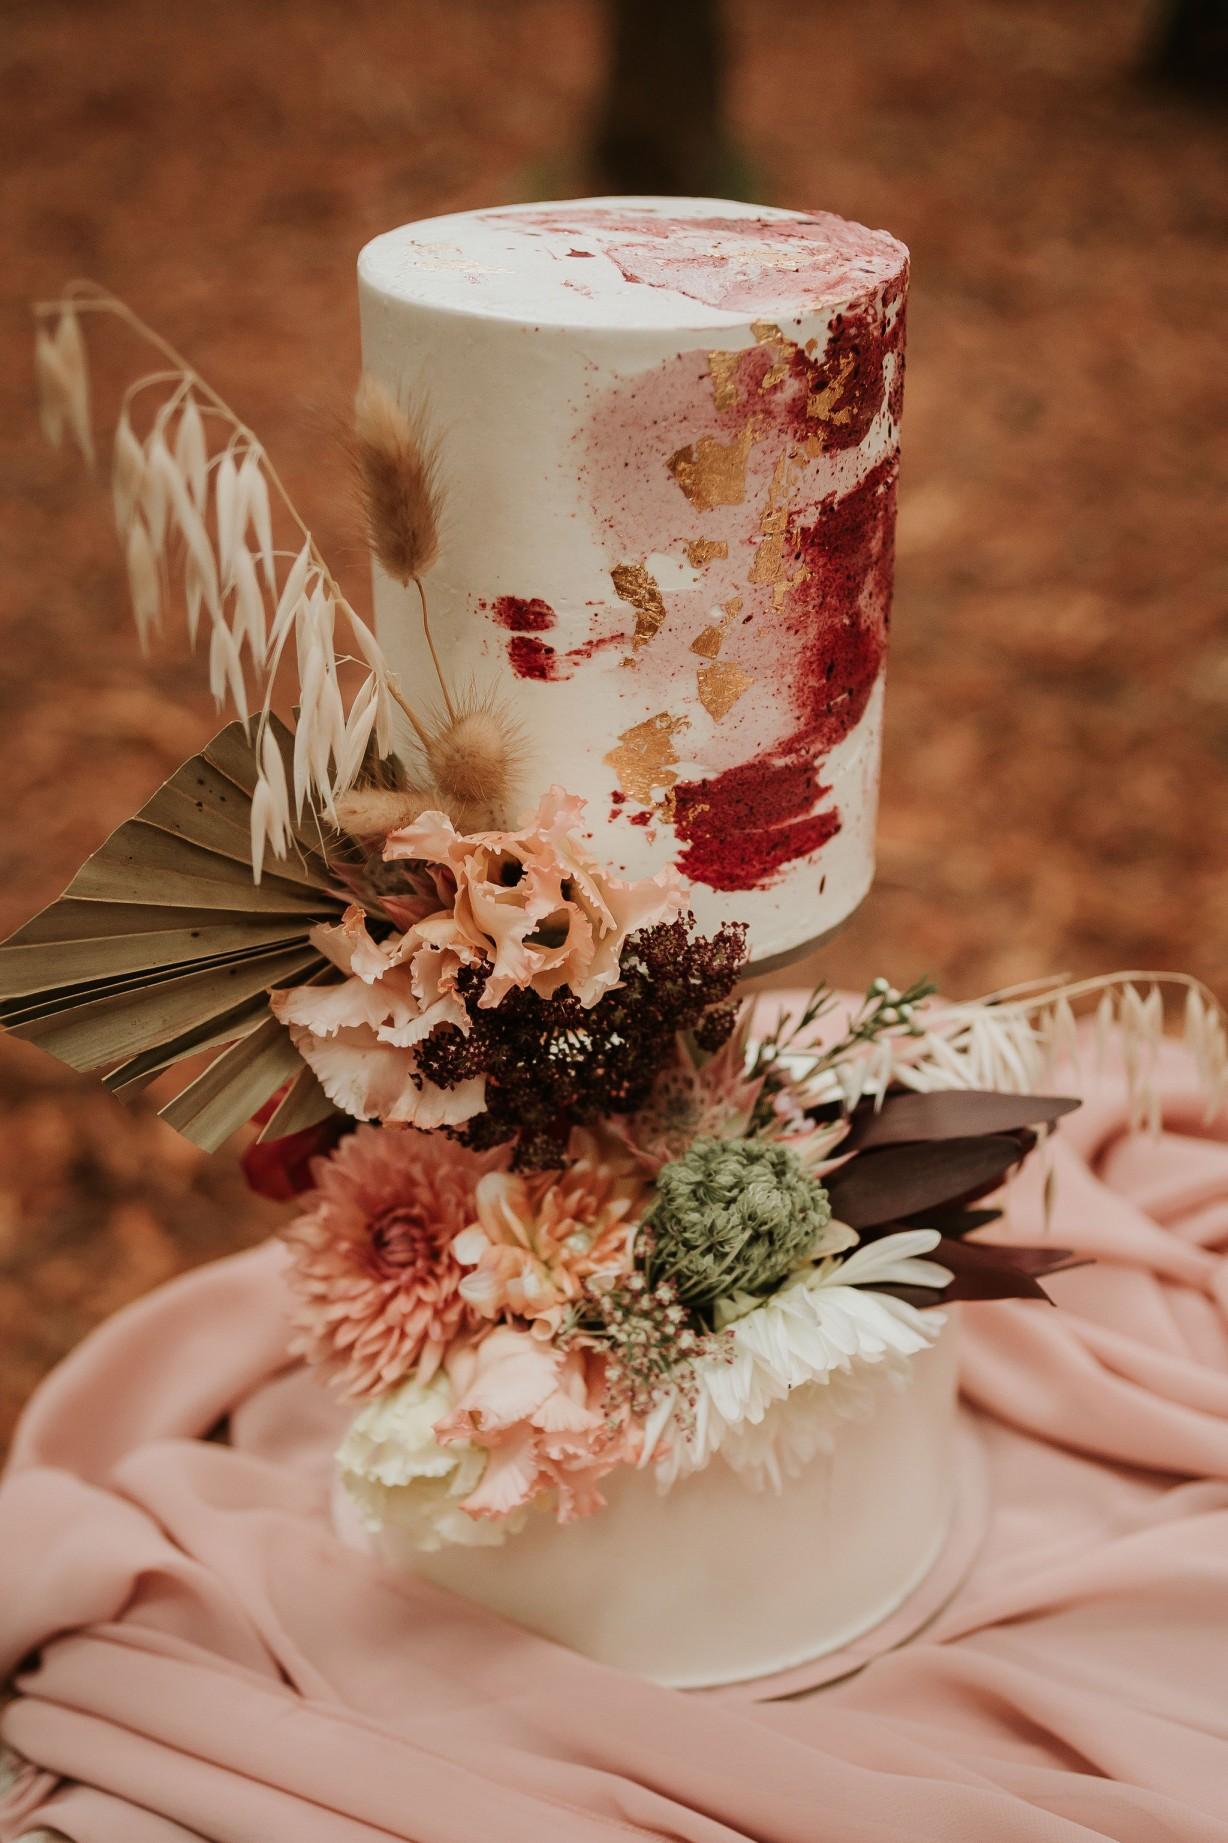 artistic wedding cake -alternative wedding cake - unique wedding cake - watercolour wedding cake - wedding cake art